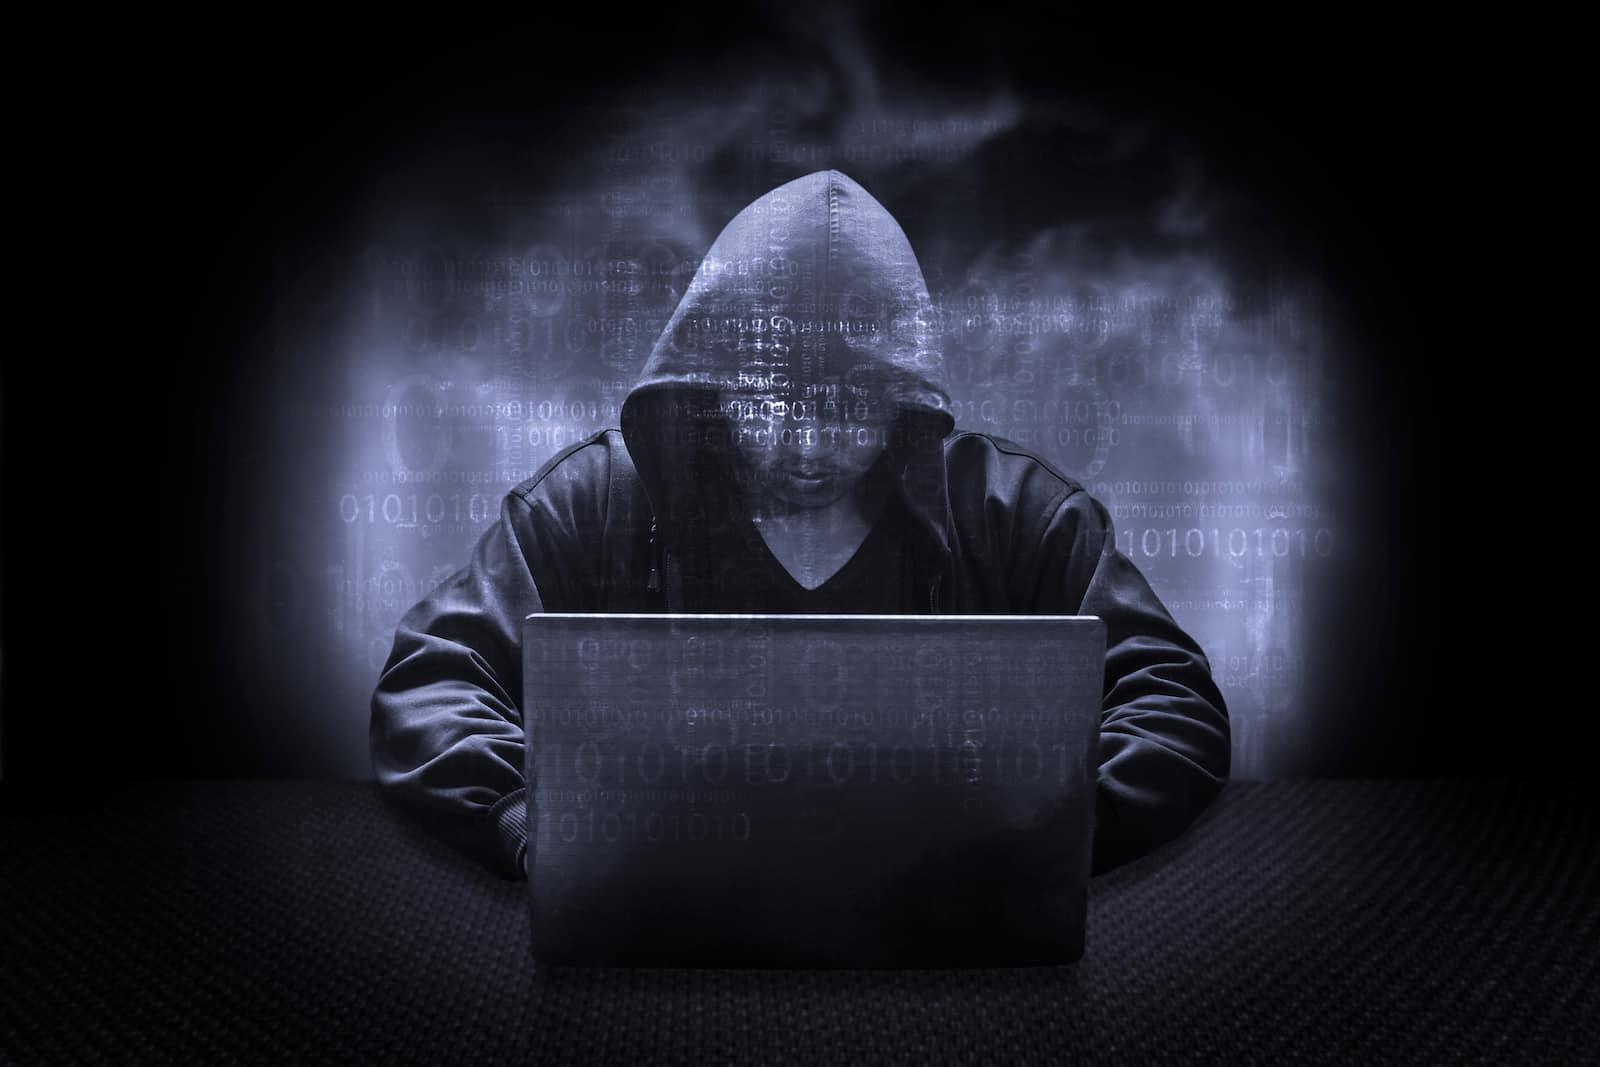 Can Antivirus Detect Spyware?